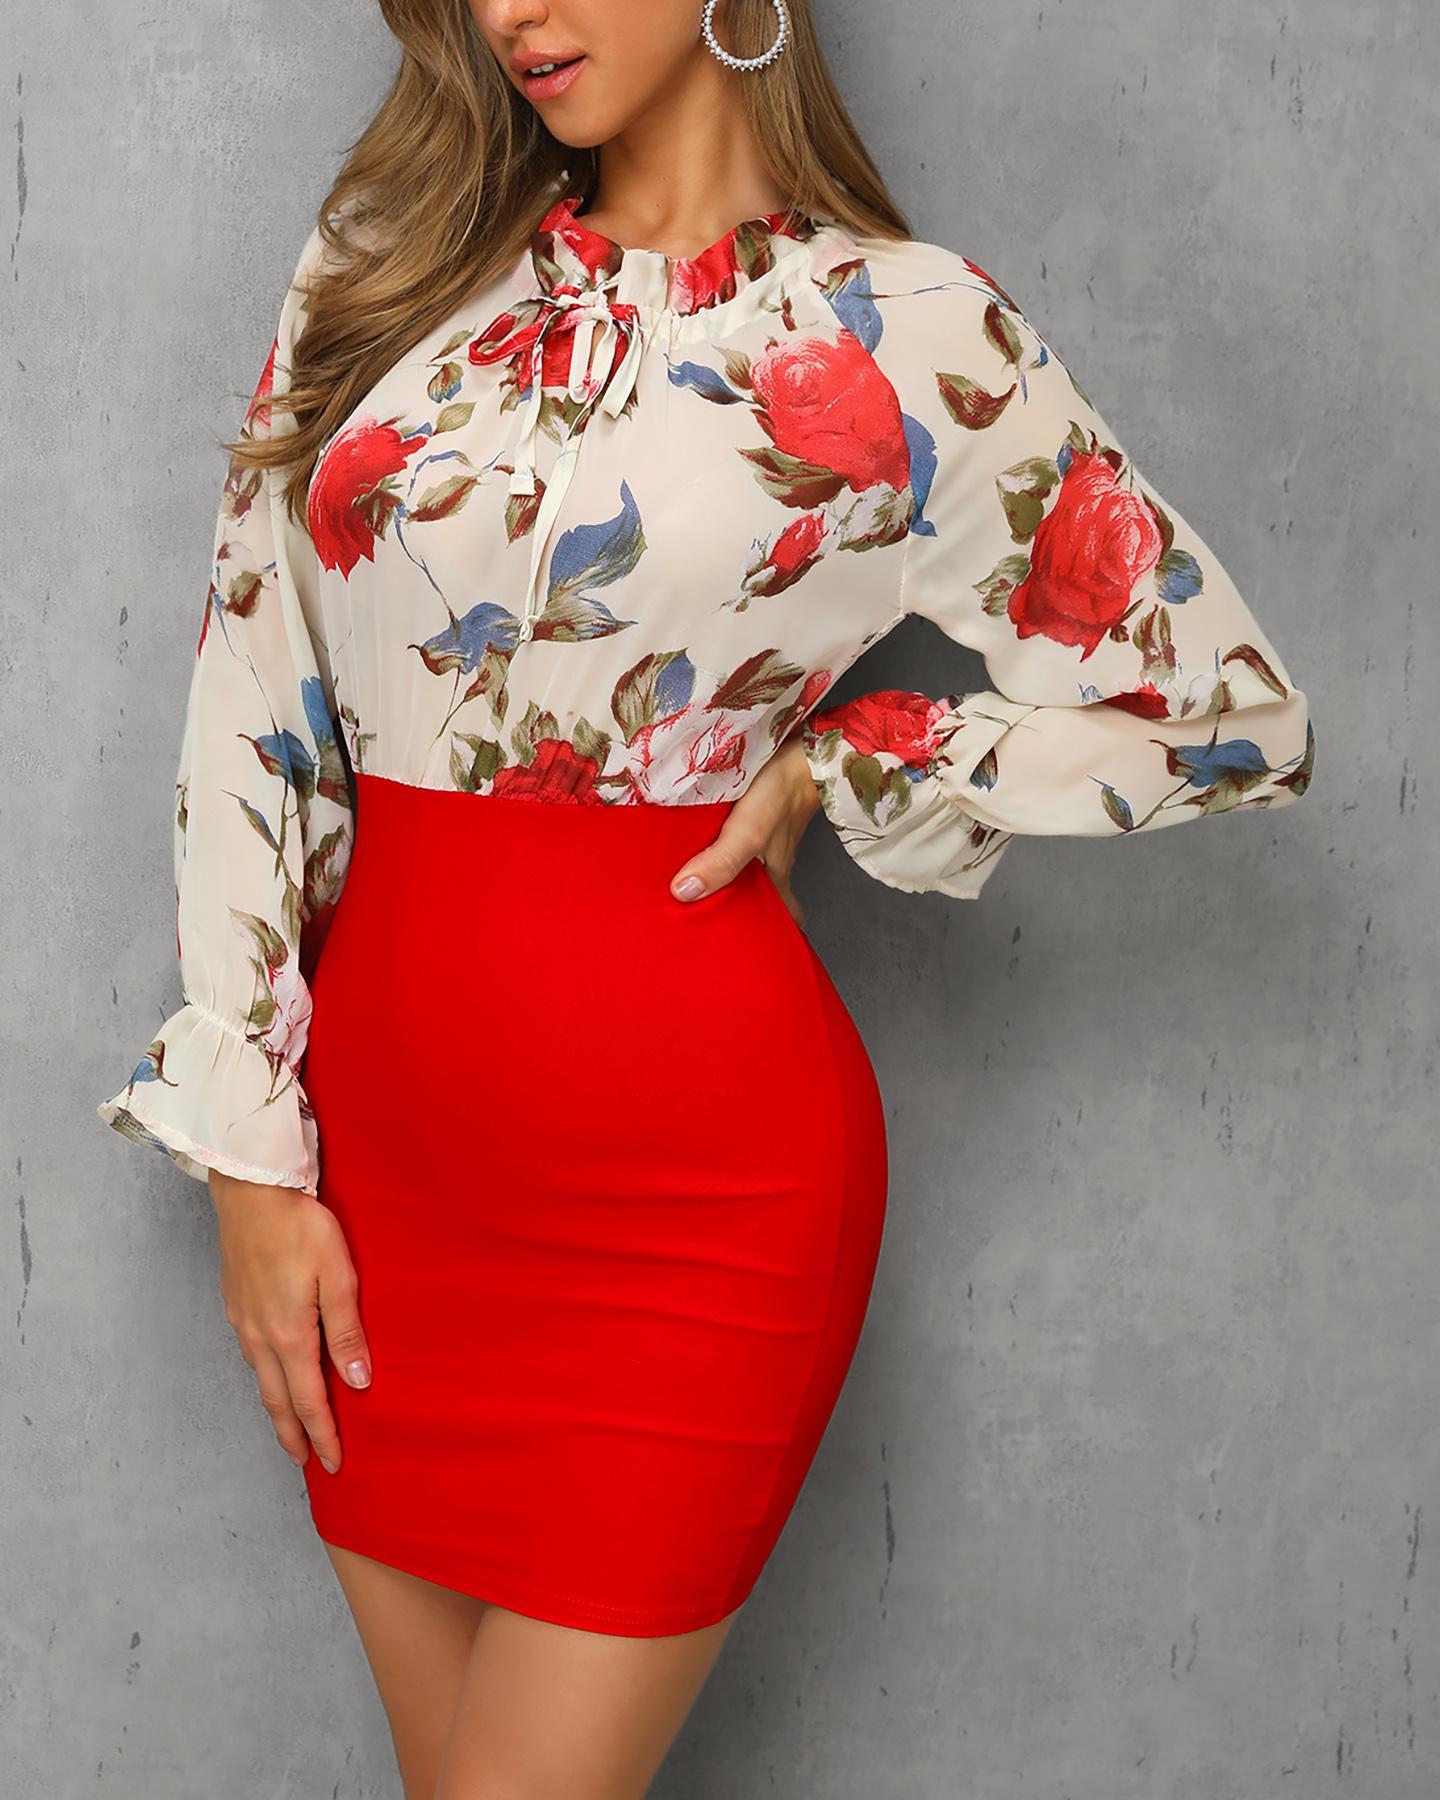 Floral Print Insert Ruffles Cuff Bodycon Dress